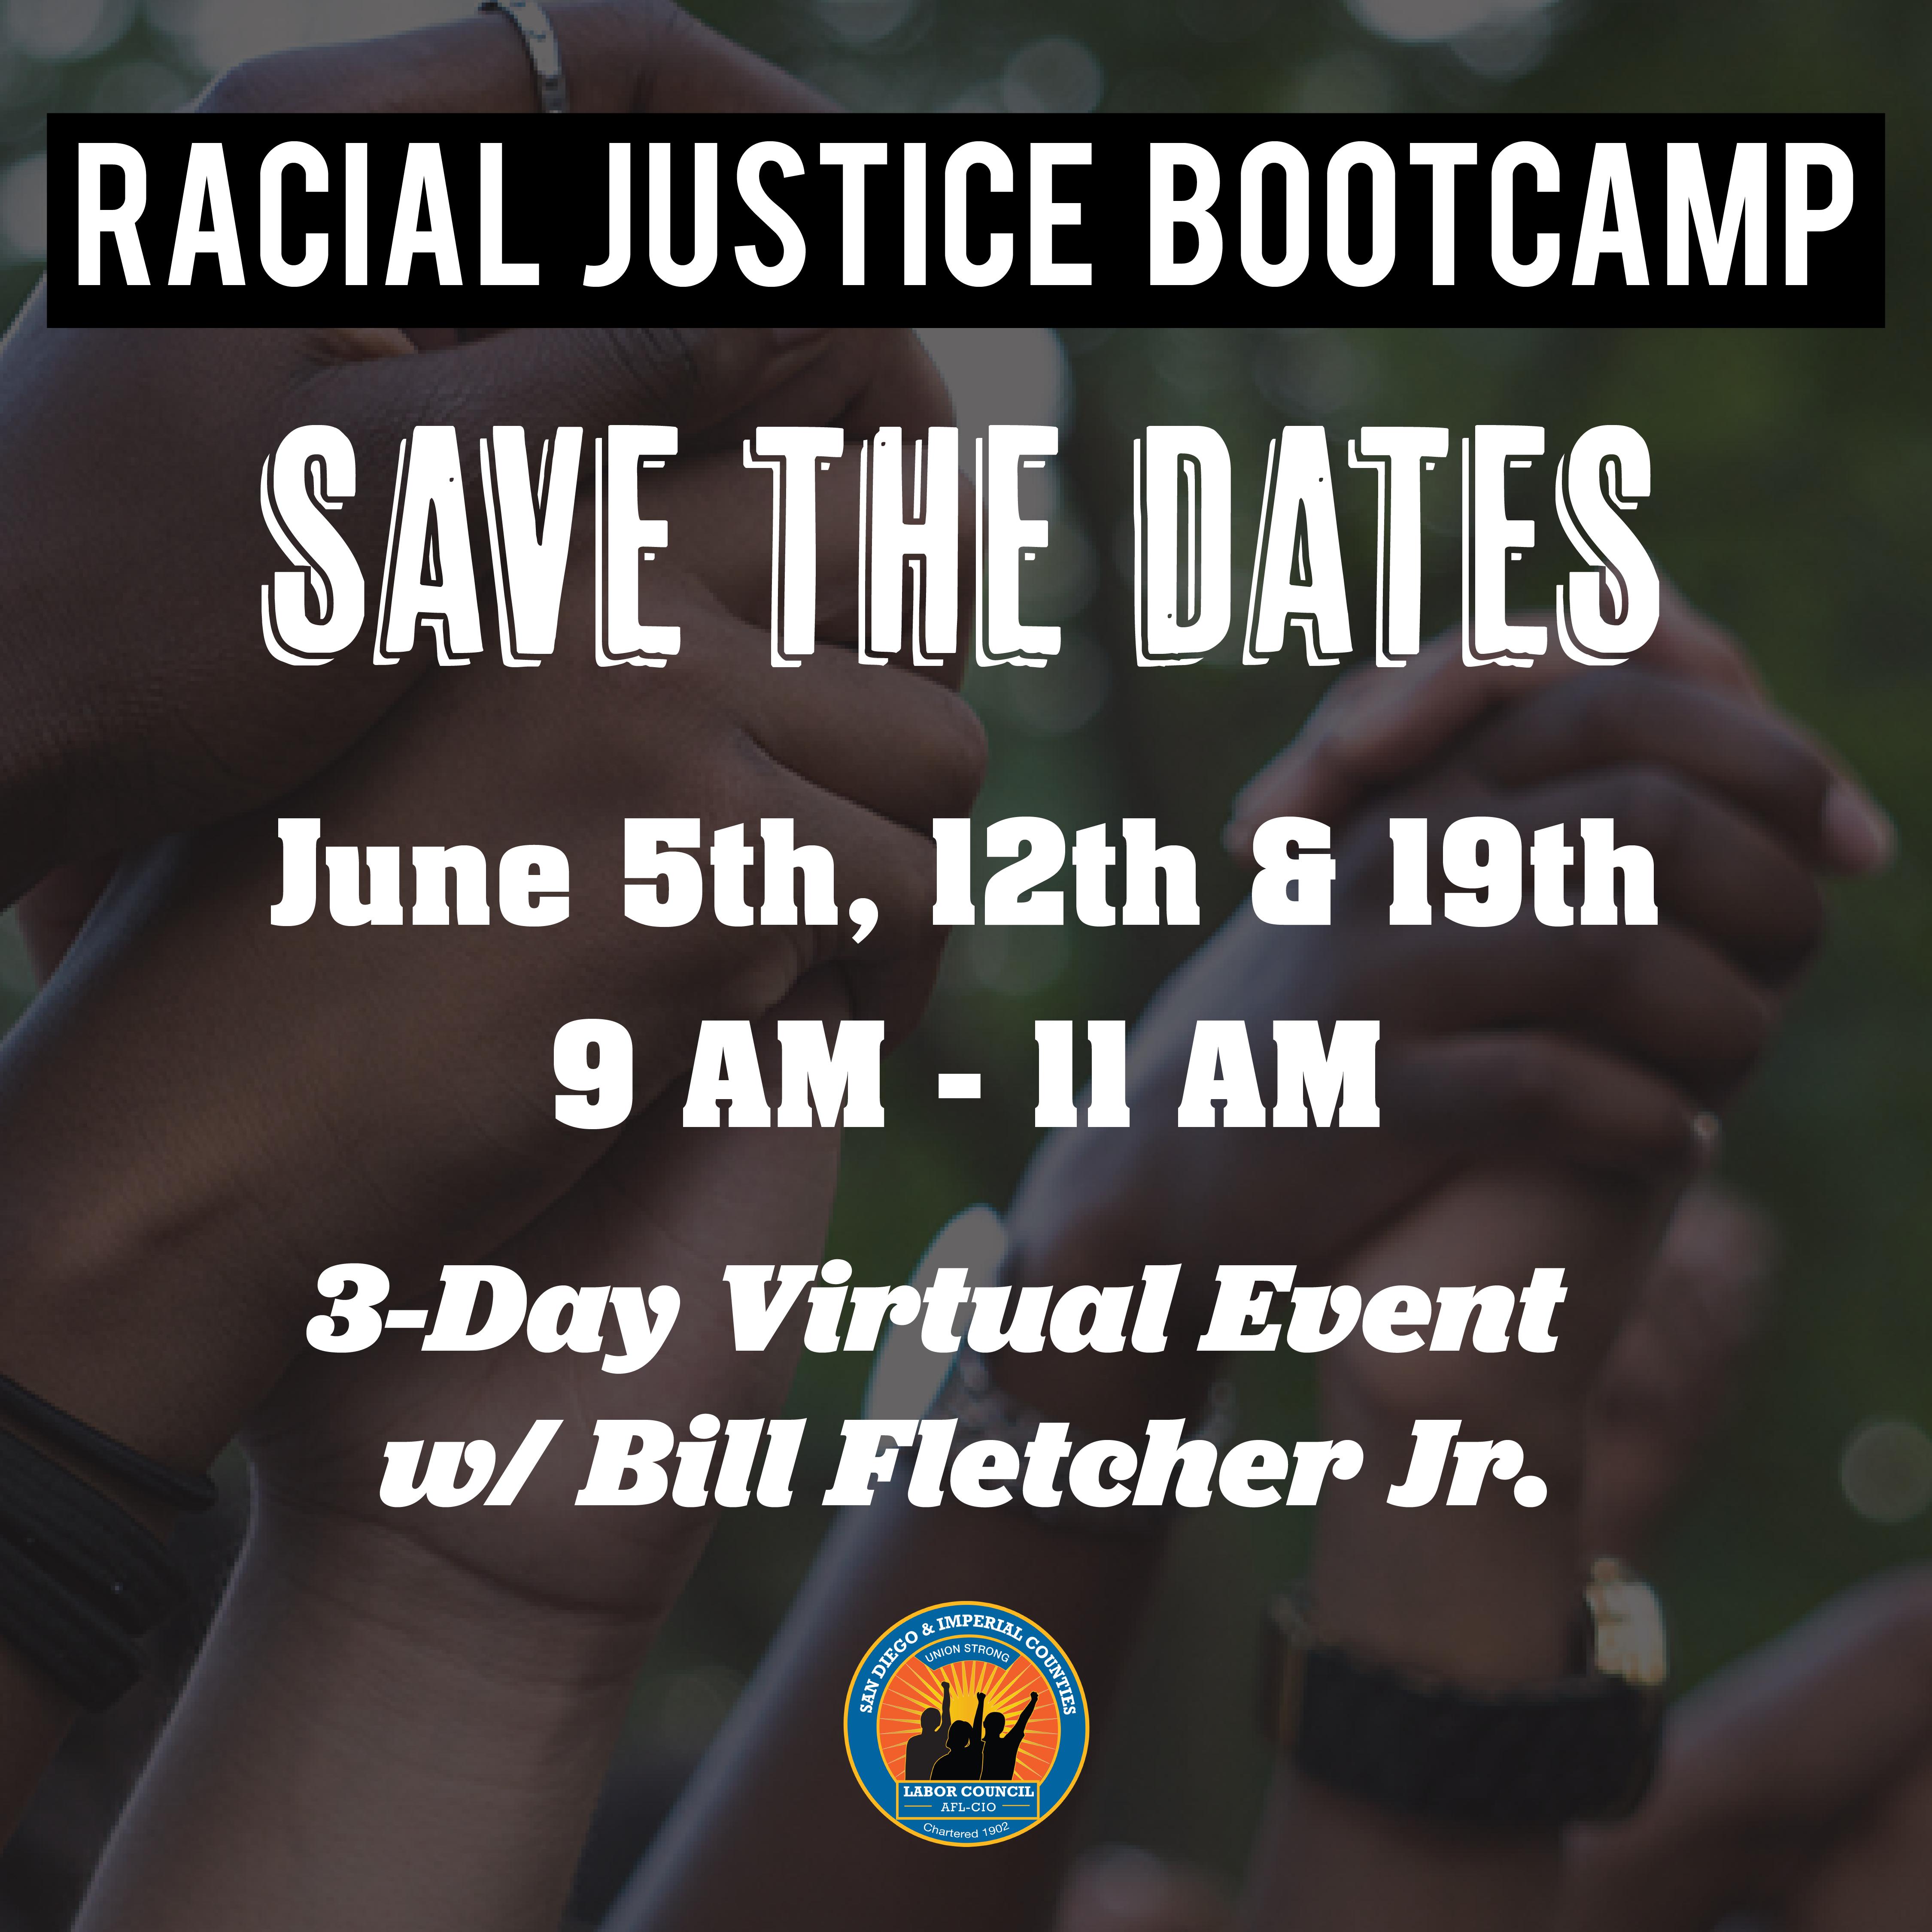 Racial_justice_bootcamp-01